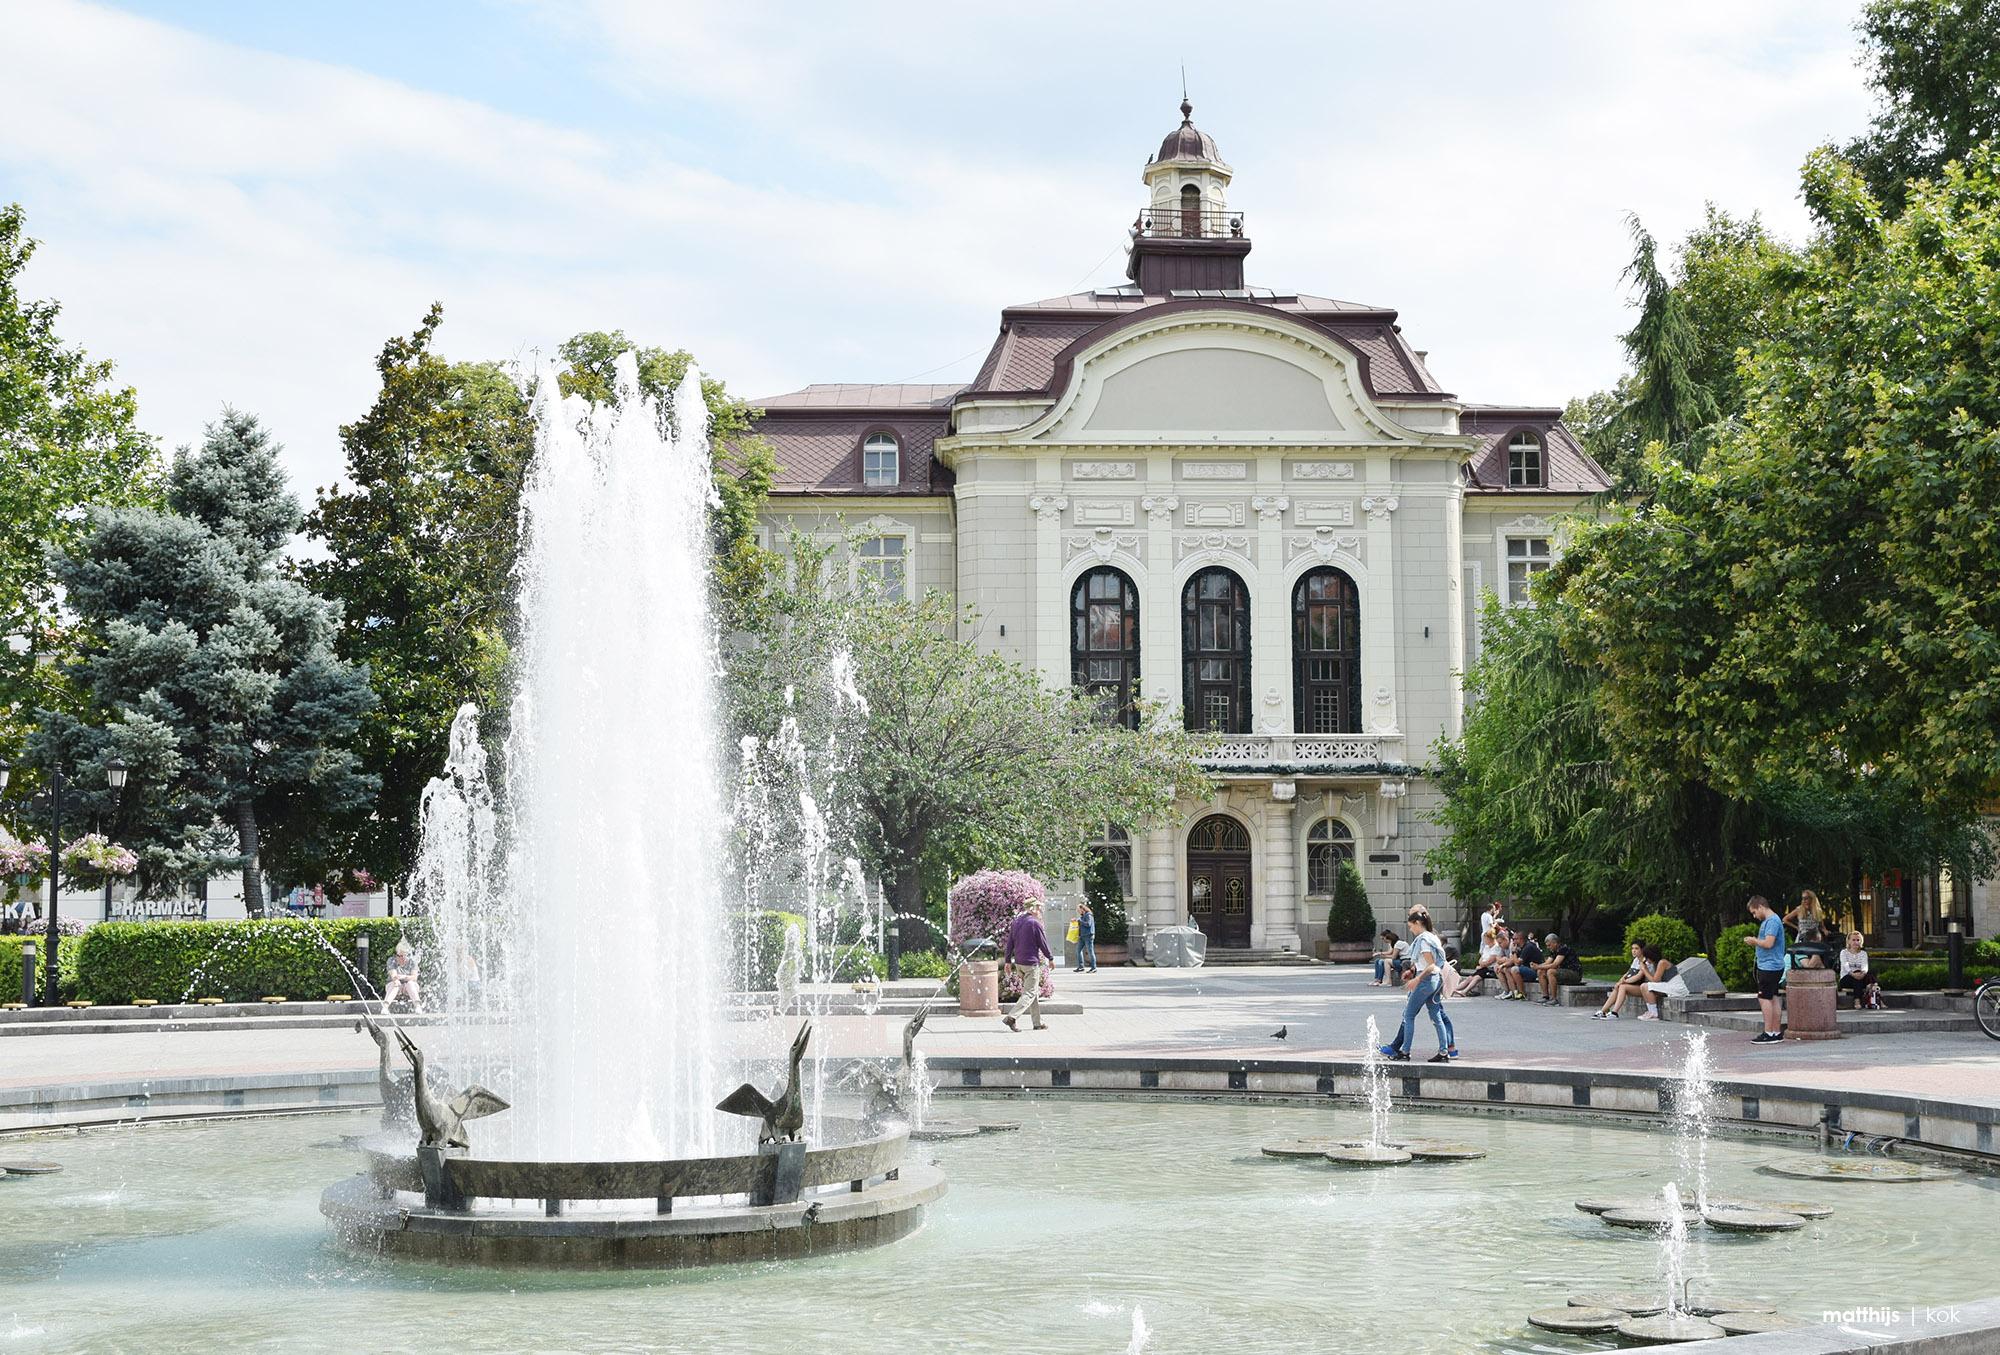 Plovdiv Municipality, Stefan Stambolov square, Plovdiv, Bulgaria | Photo by Matthijs Kok